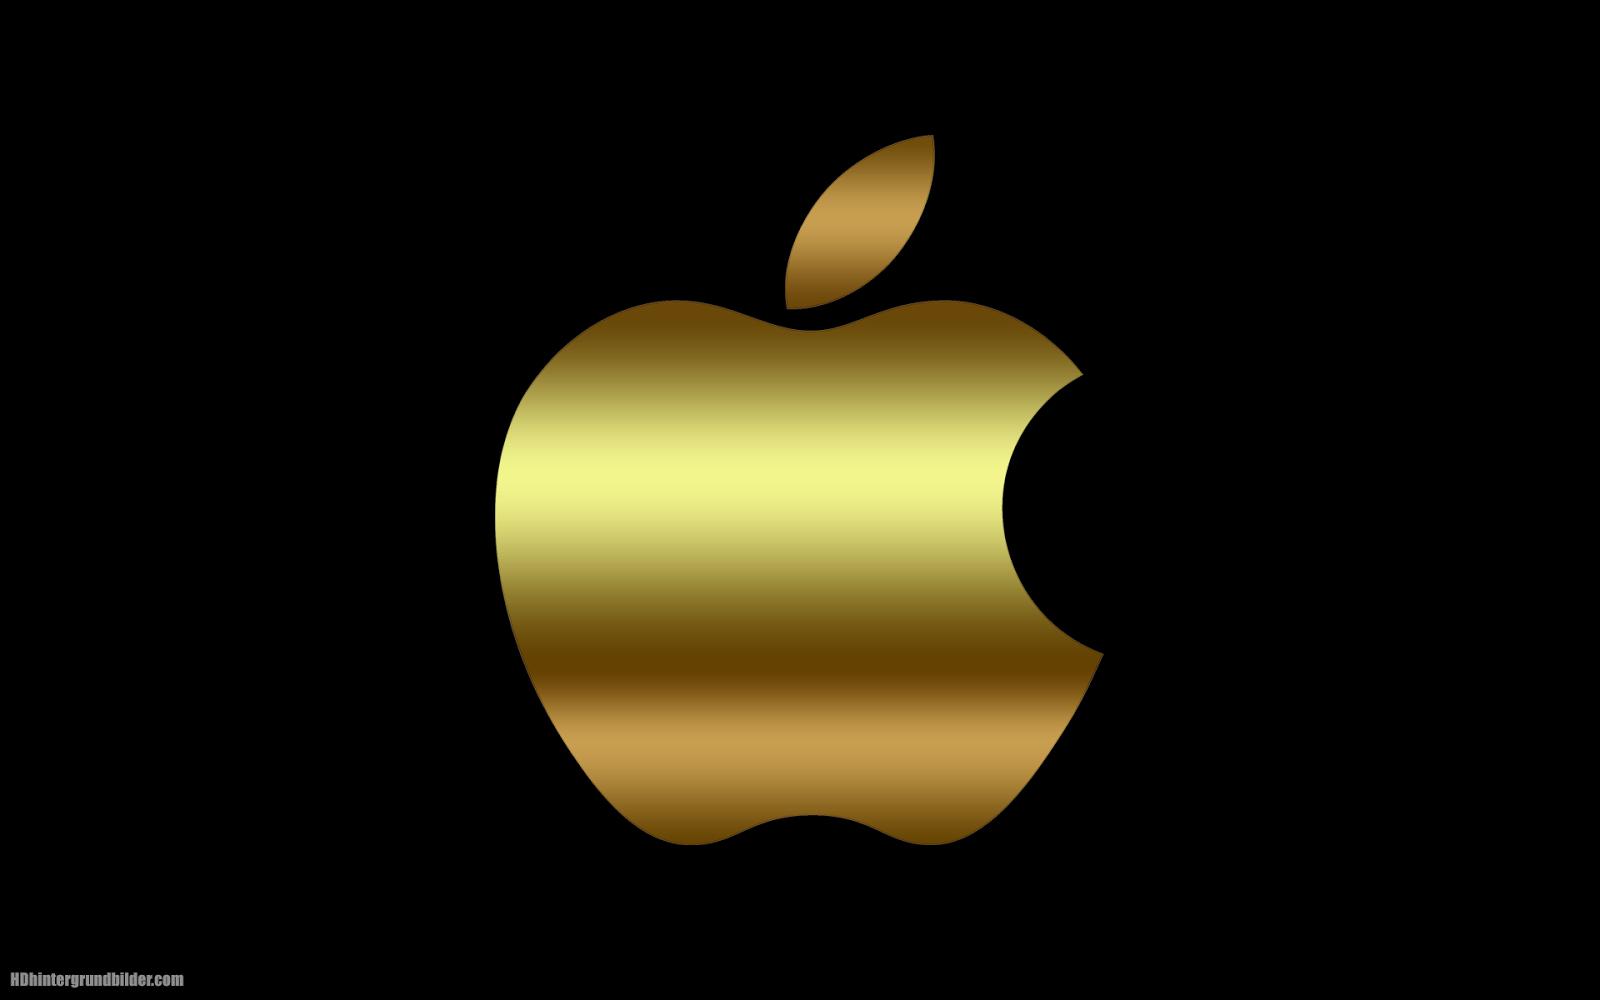 Download Apple Wallpaper Desktop Iphone Logo Macbook Hq Png